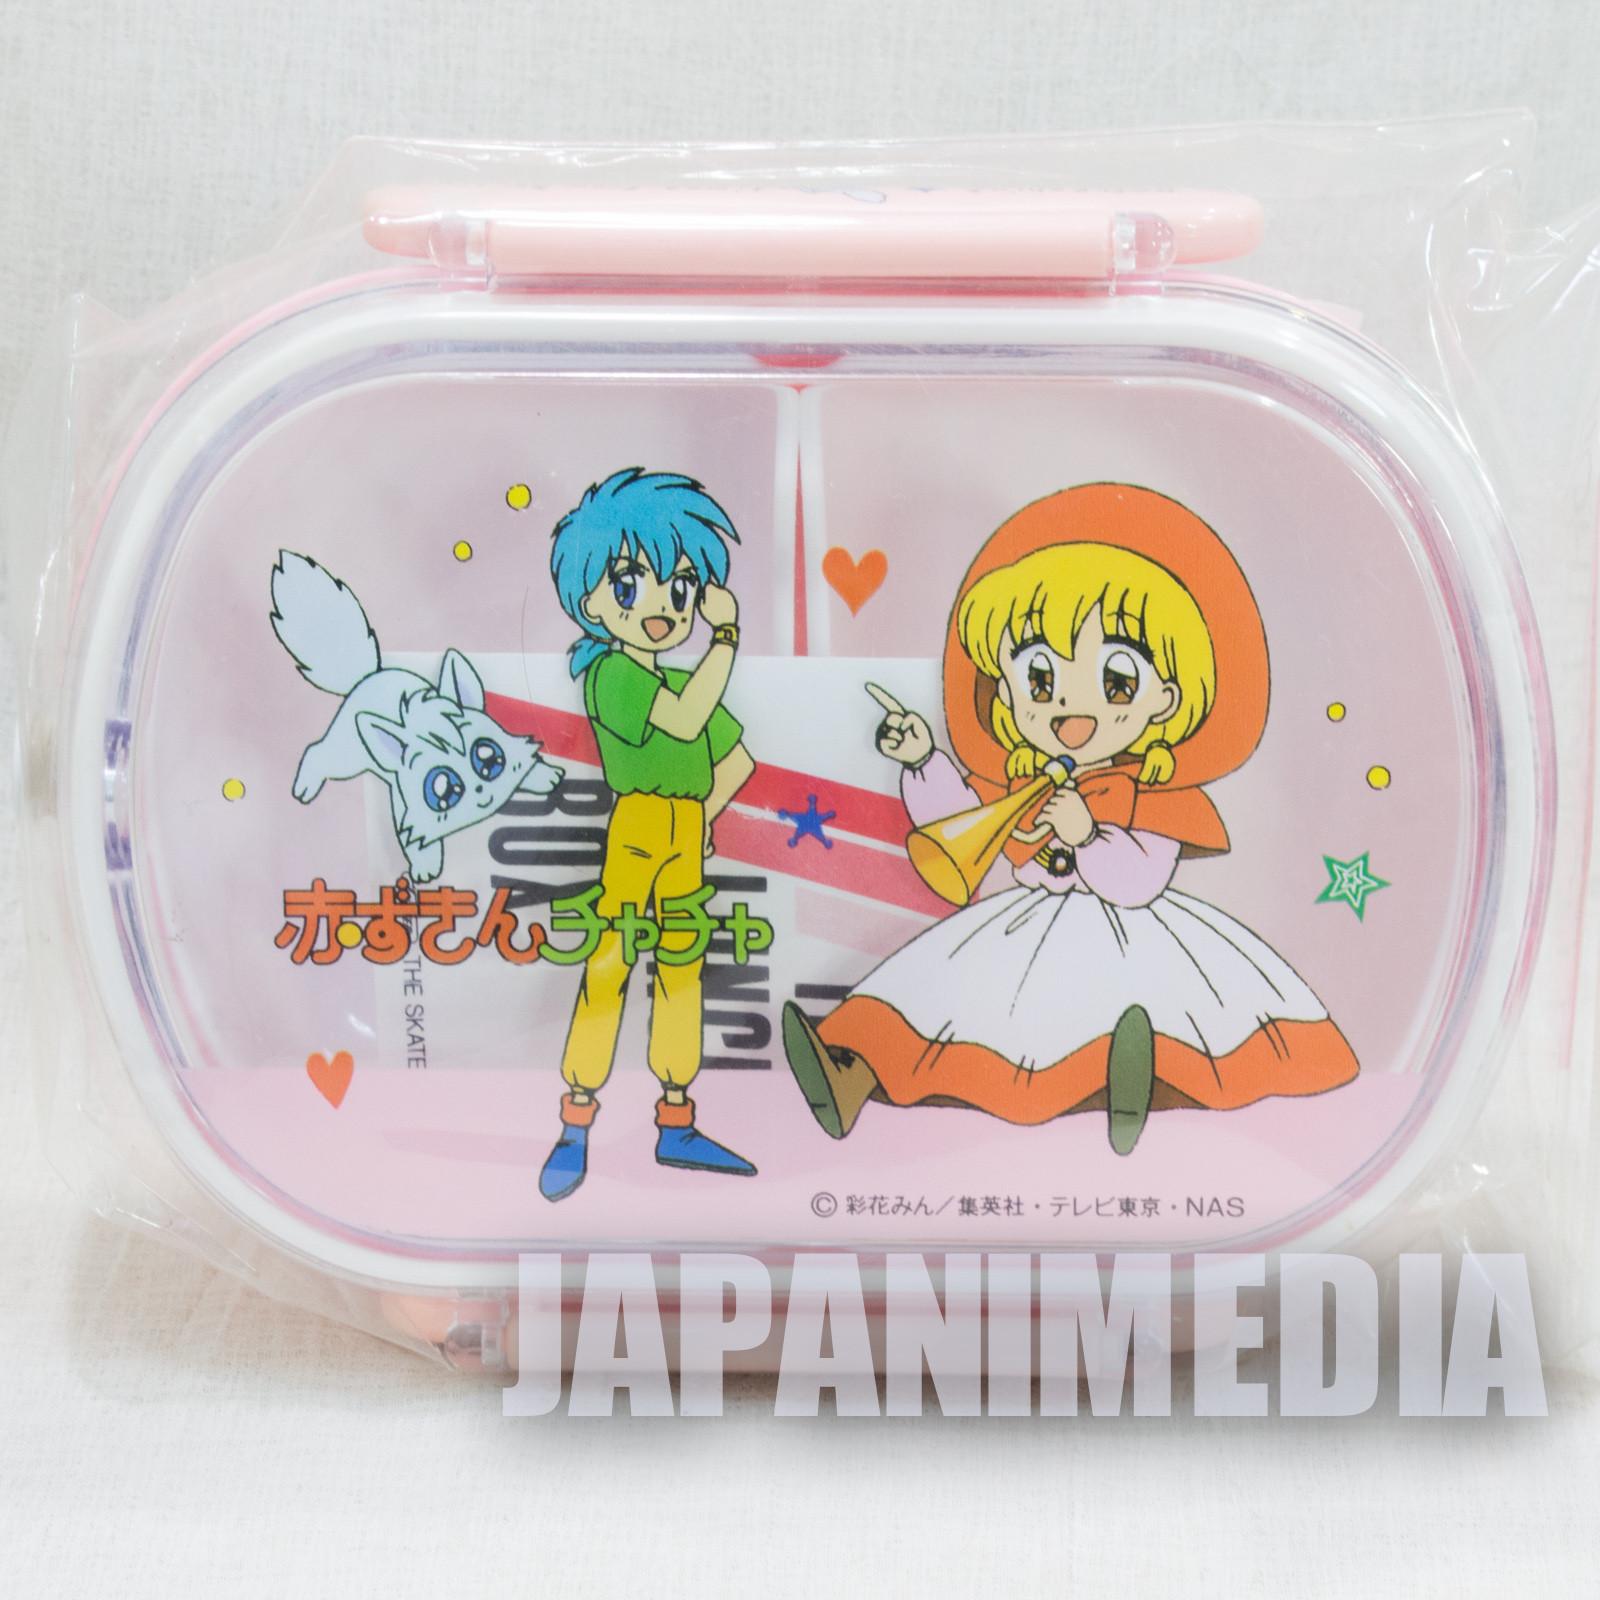 Akazukin Chacha Lunch Box Ribbon Comics JAPAN ANIME